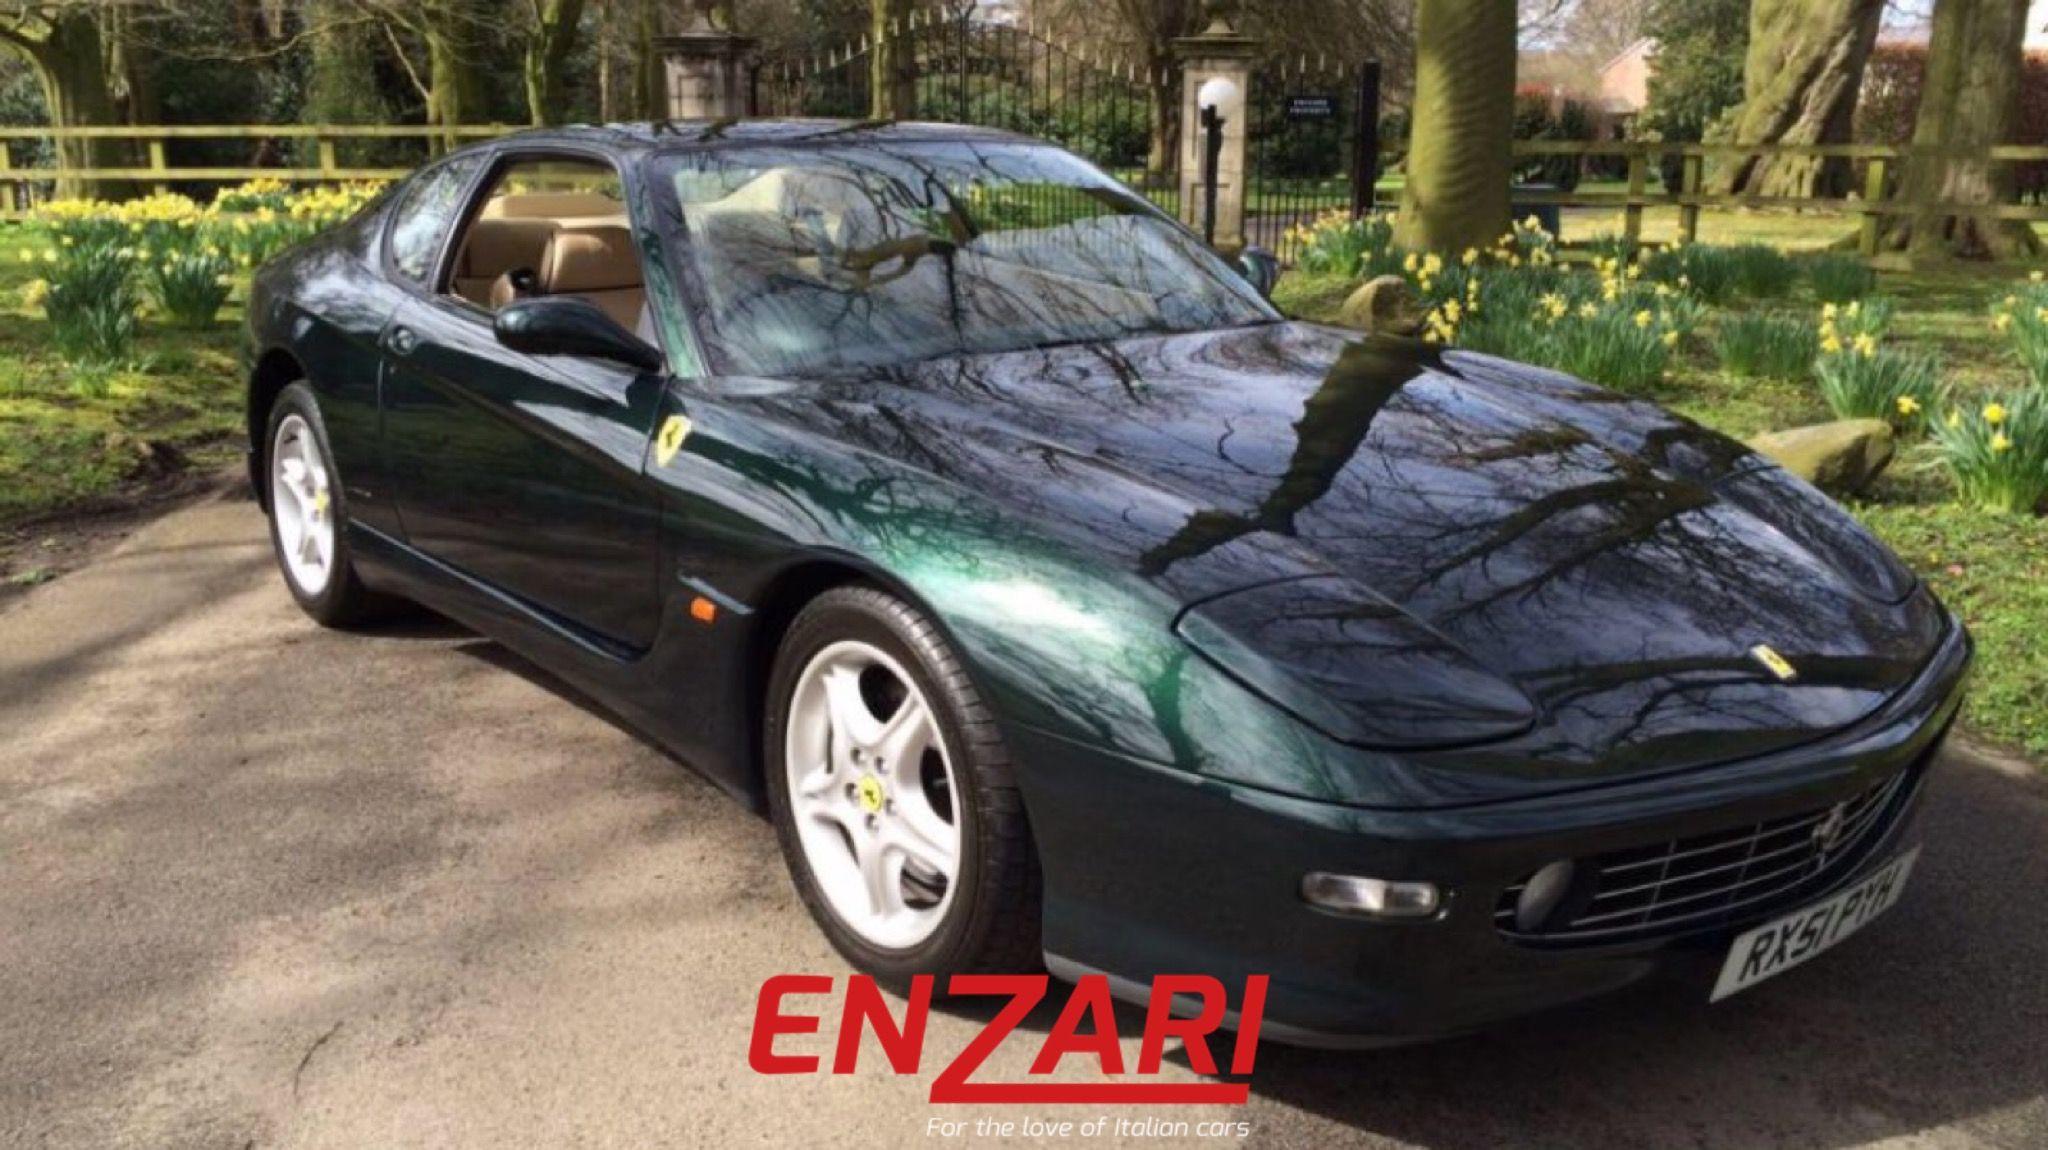 Ferrari 456 #sundayclassic #classiccars #ferrari #enzari #lancia #autoitaliane #classiccarclub #ferrari456 #italy #cars #loveitaliancars